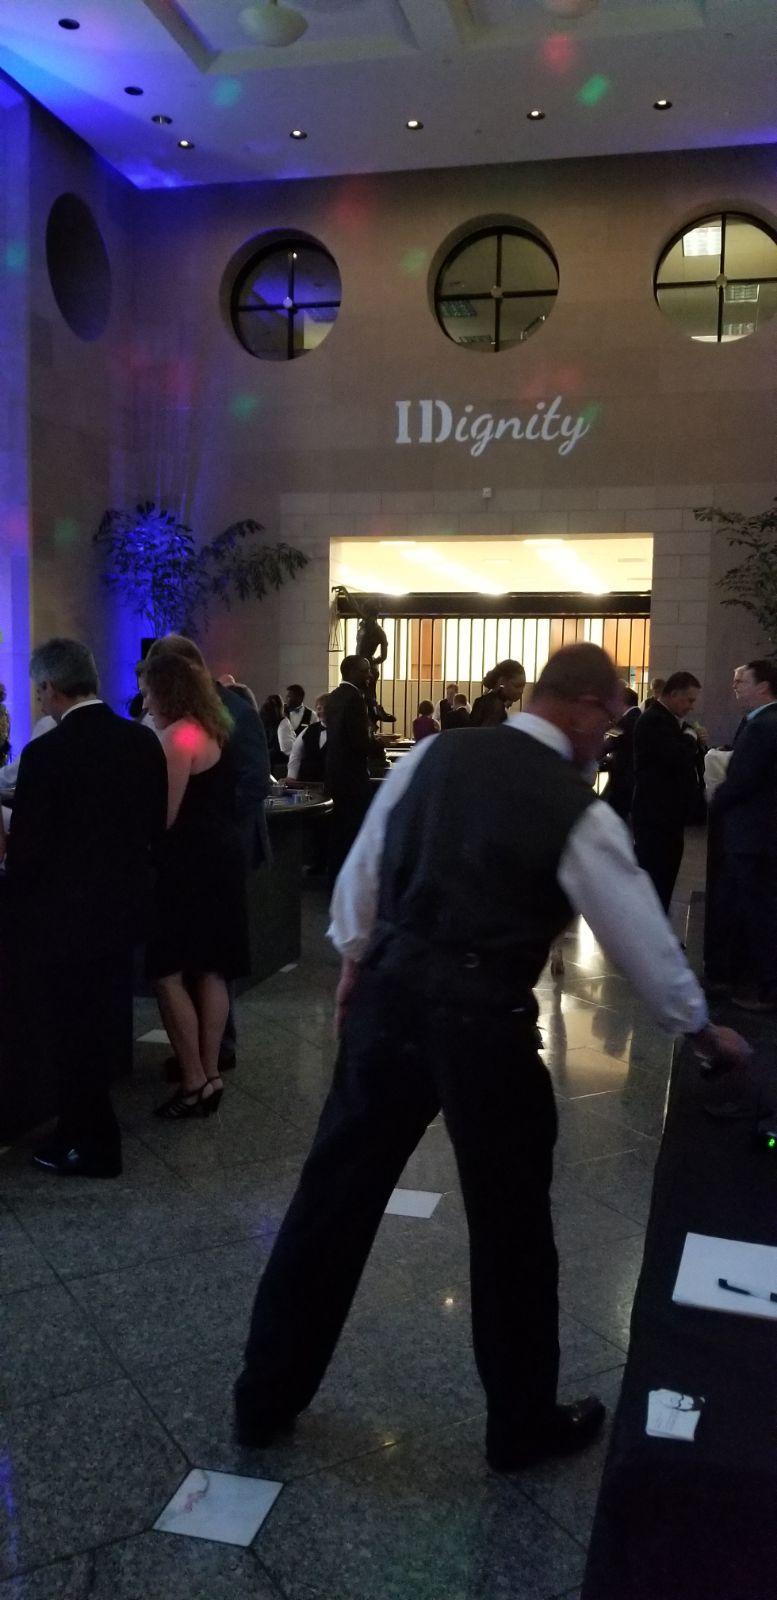 IDignity Charity Fundraiser Gala